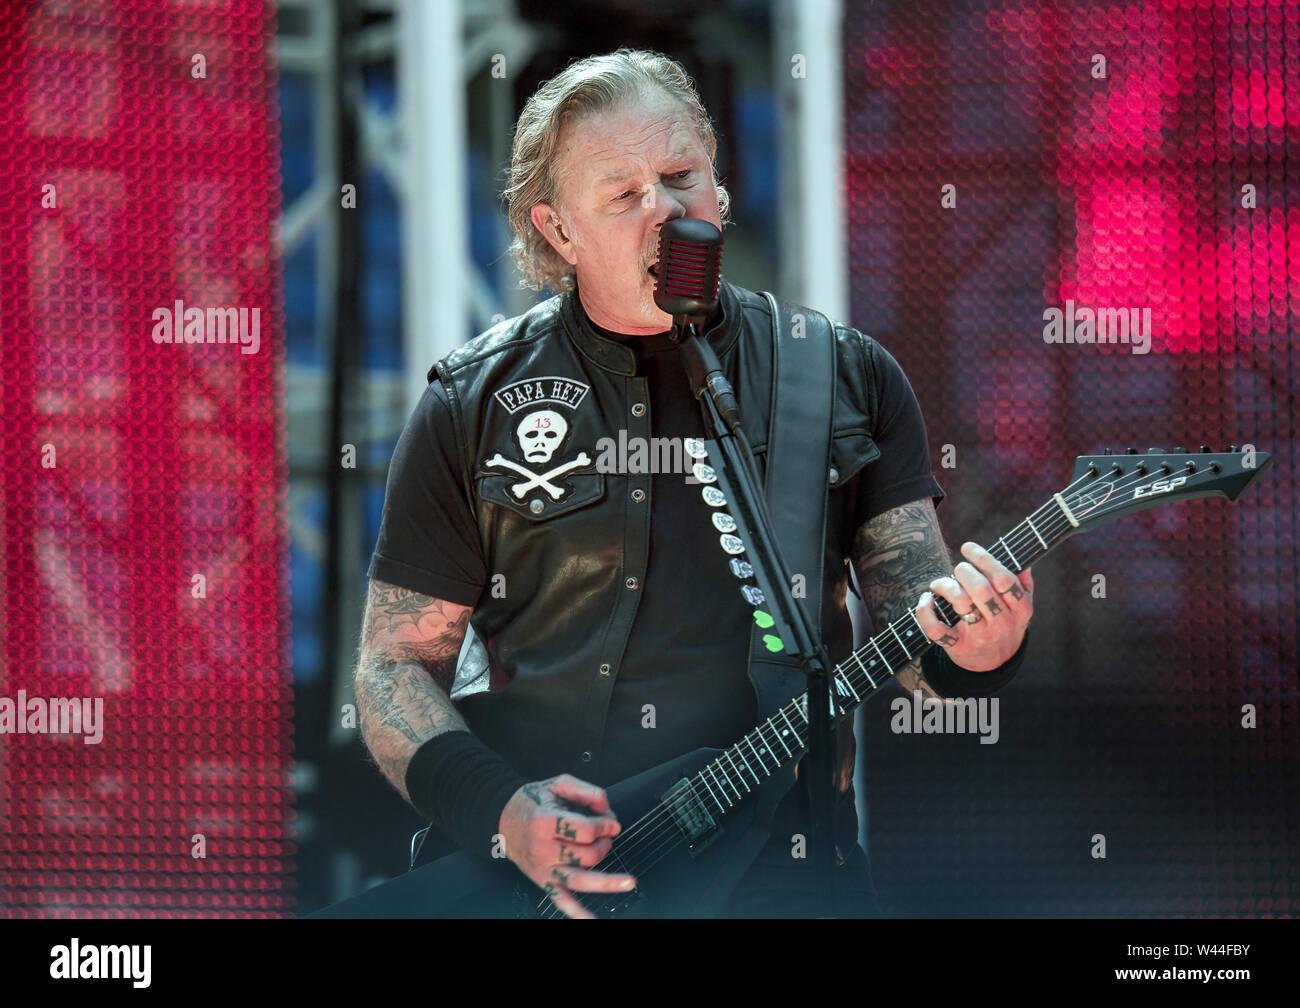 Metallica Performing On Their Worldwired Tour 2019 at Manchester Etihad Stadium Featuring: Metallica, James Hetfield Where: Manchester, United Kingdom When: 18 Jun 2019 Credit: Sakura/WENN.com - Stock Image